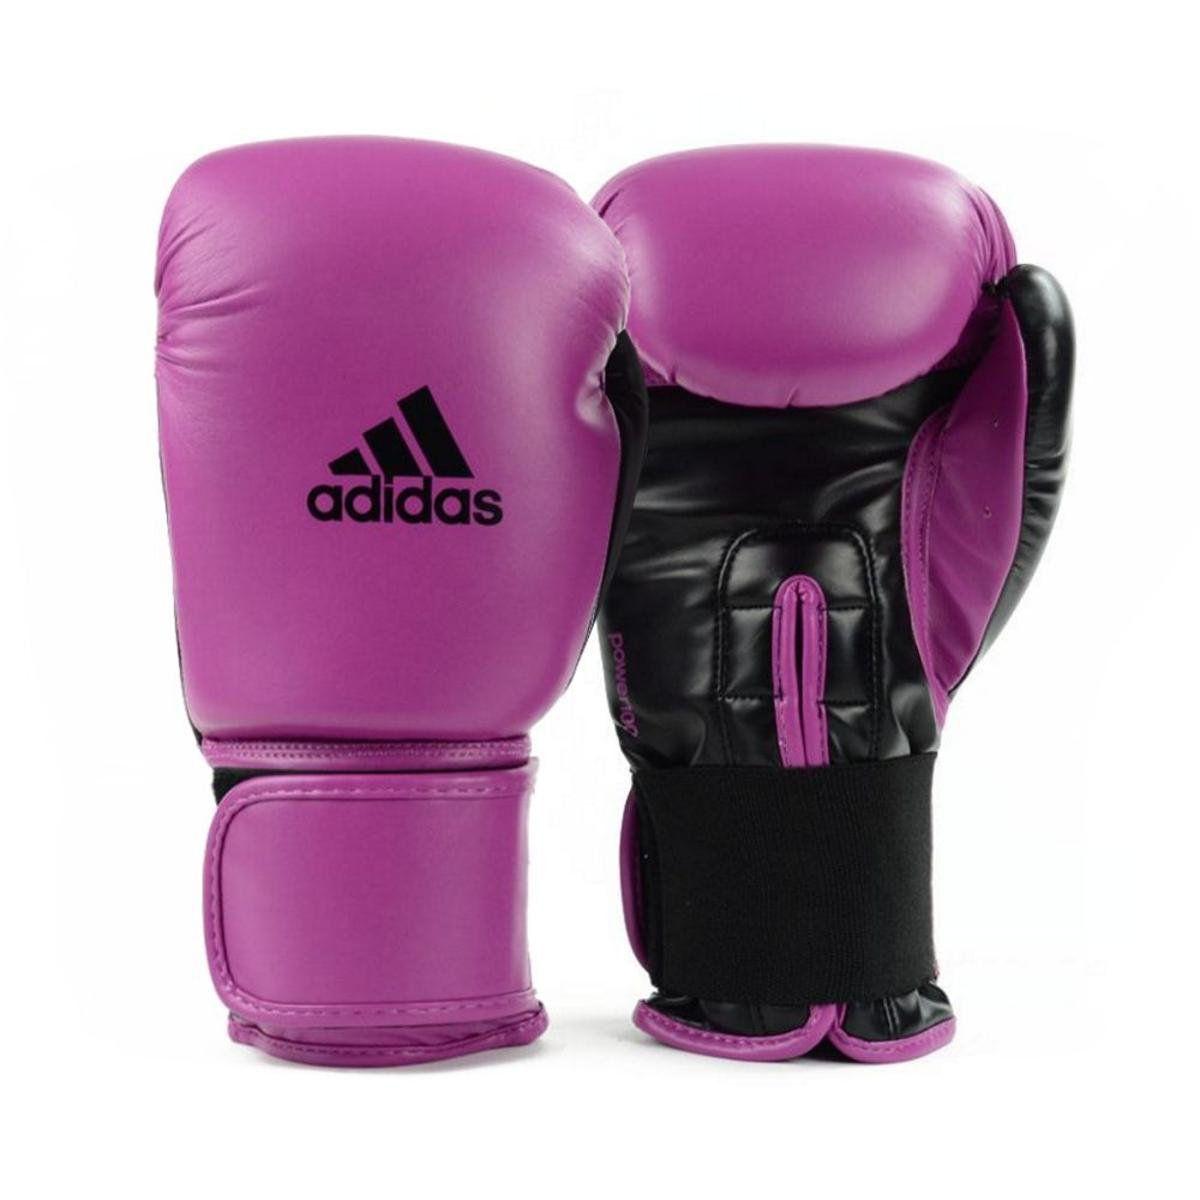 Luvas Boxe Muay Thai - Adidas Power 100 - Rosa - 14 OZ